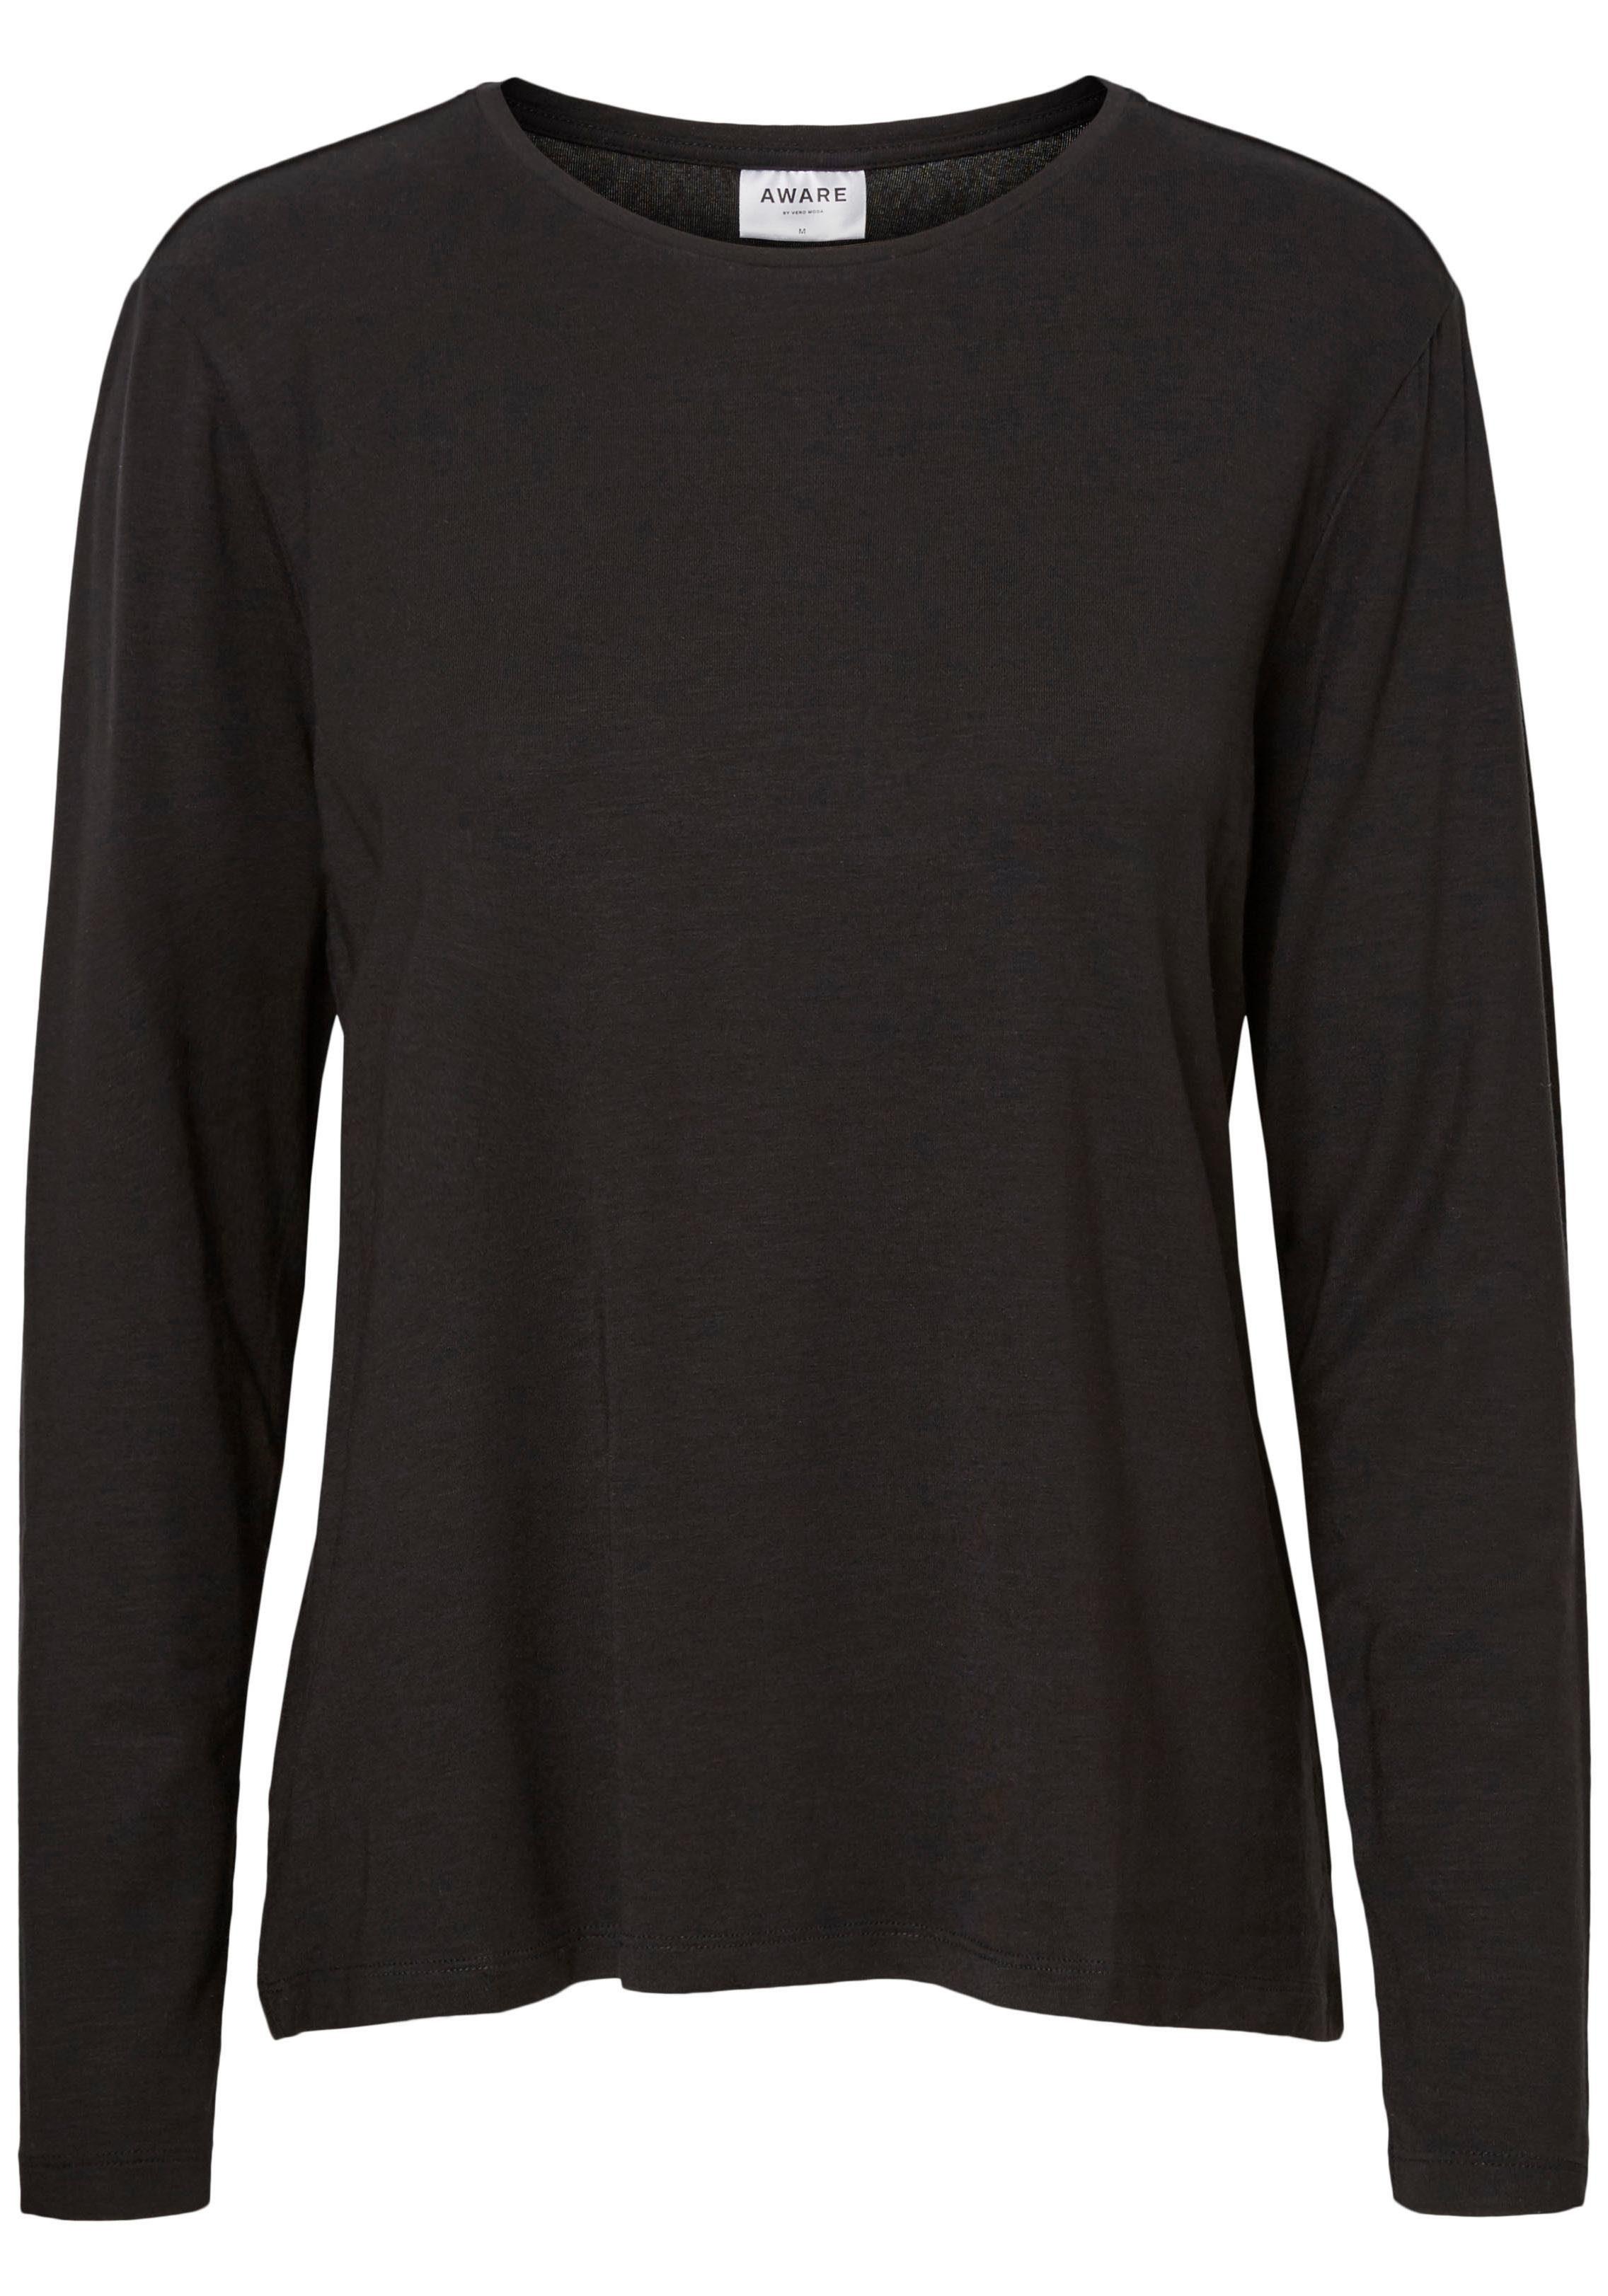 Vero Moda Damen Langarmshirt mit Spitze Damenshirt Langarm Shirt Damenoberteil